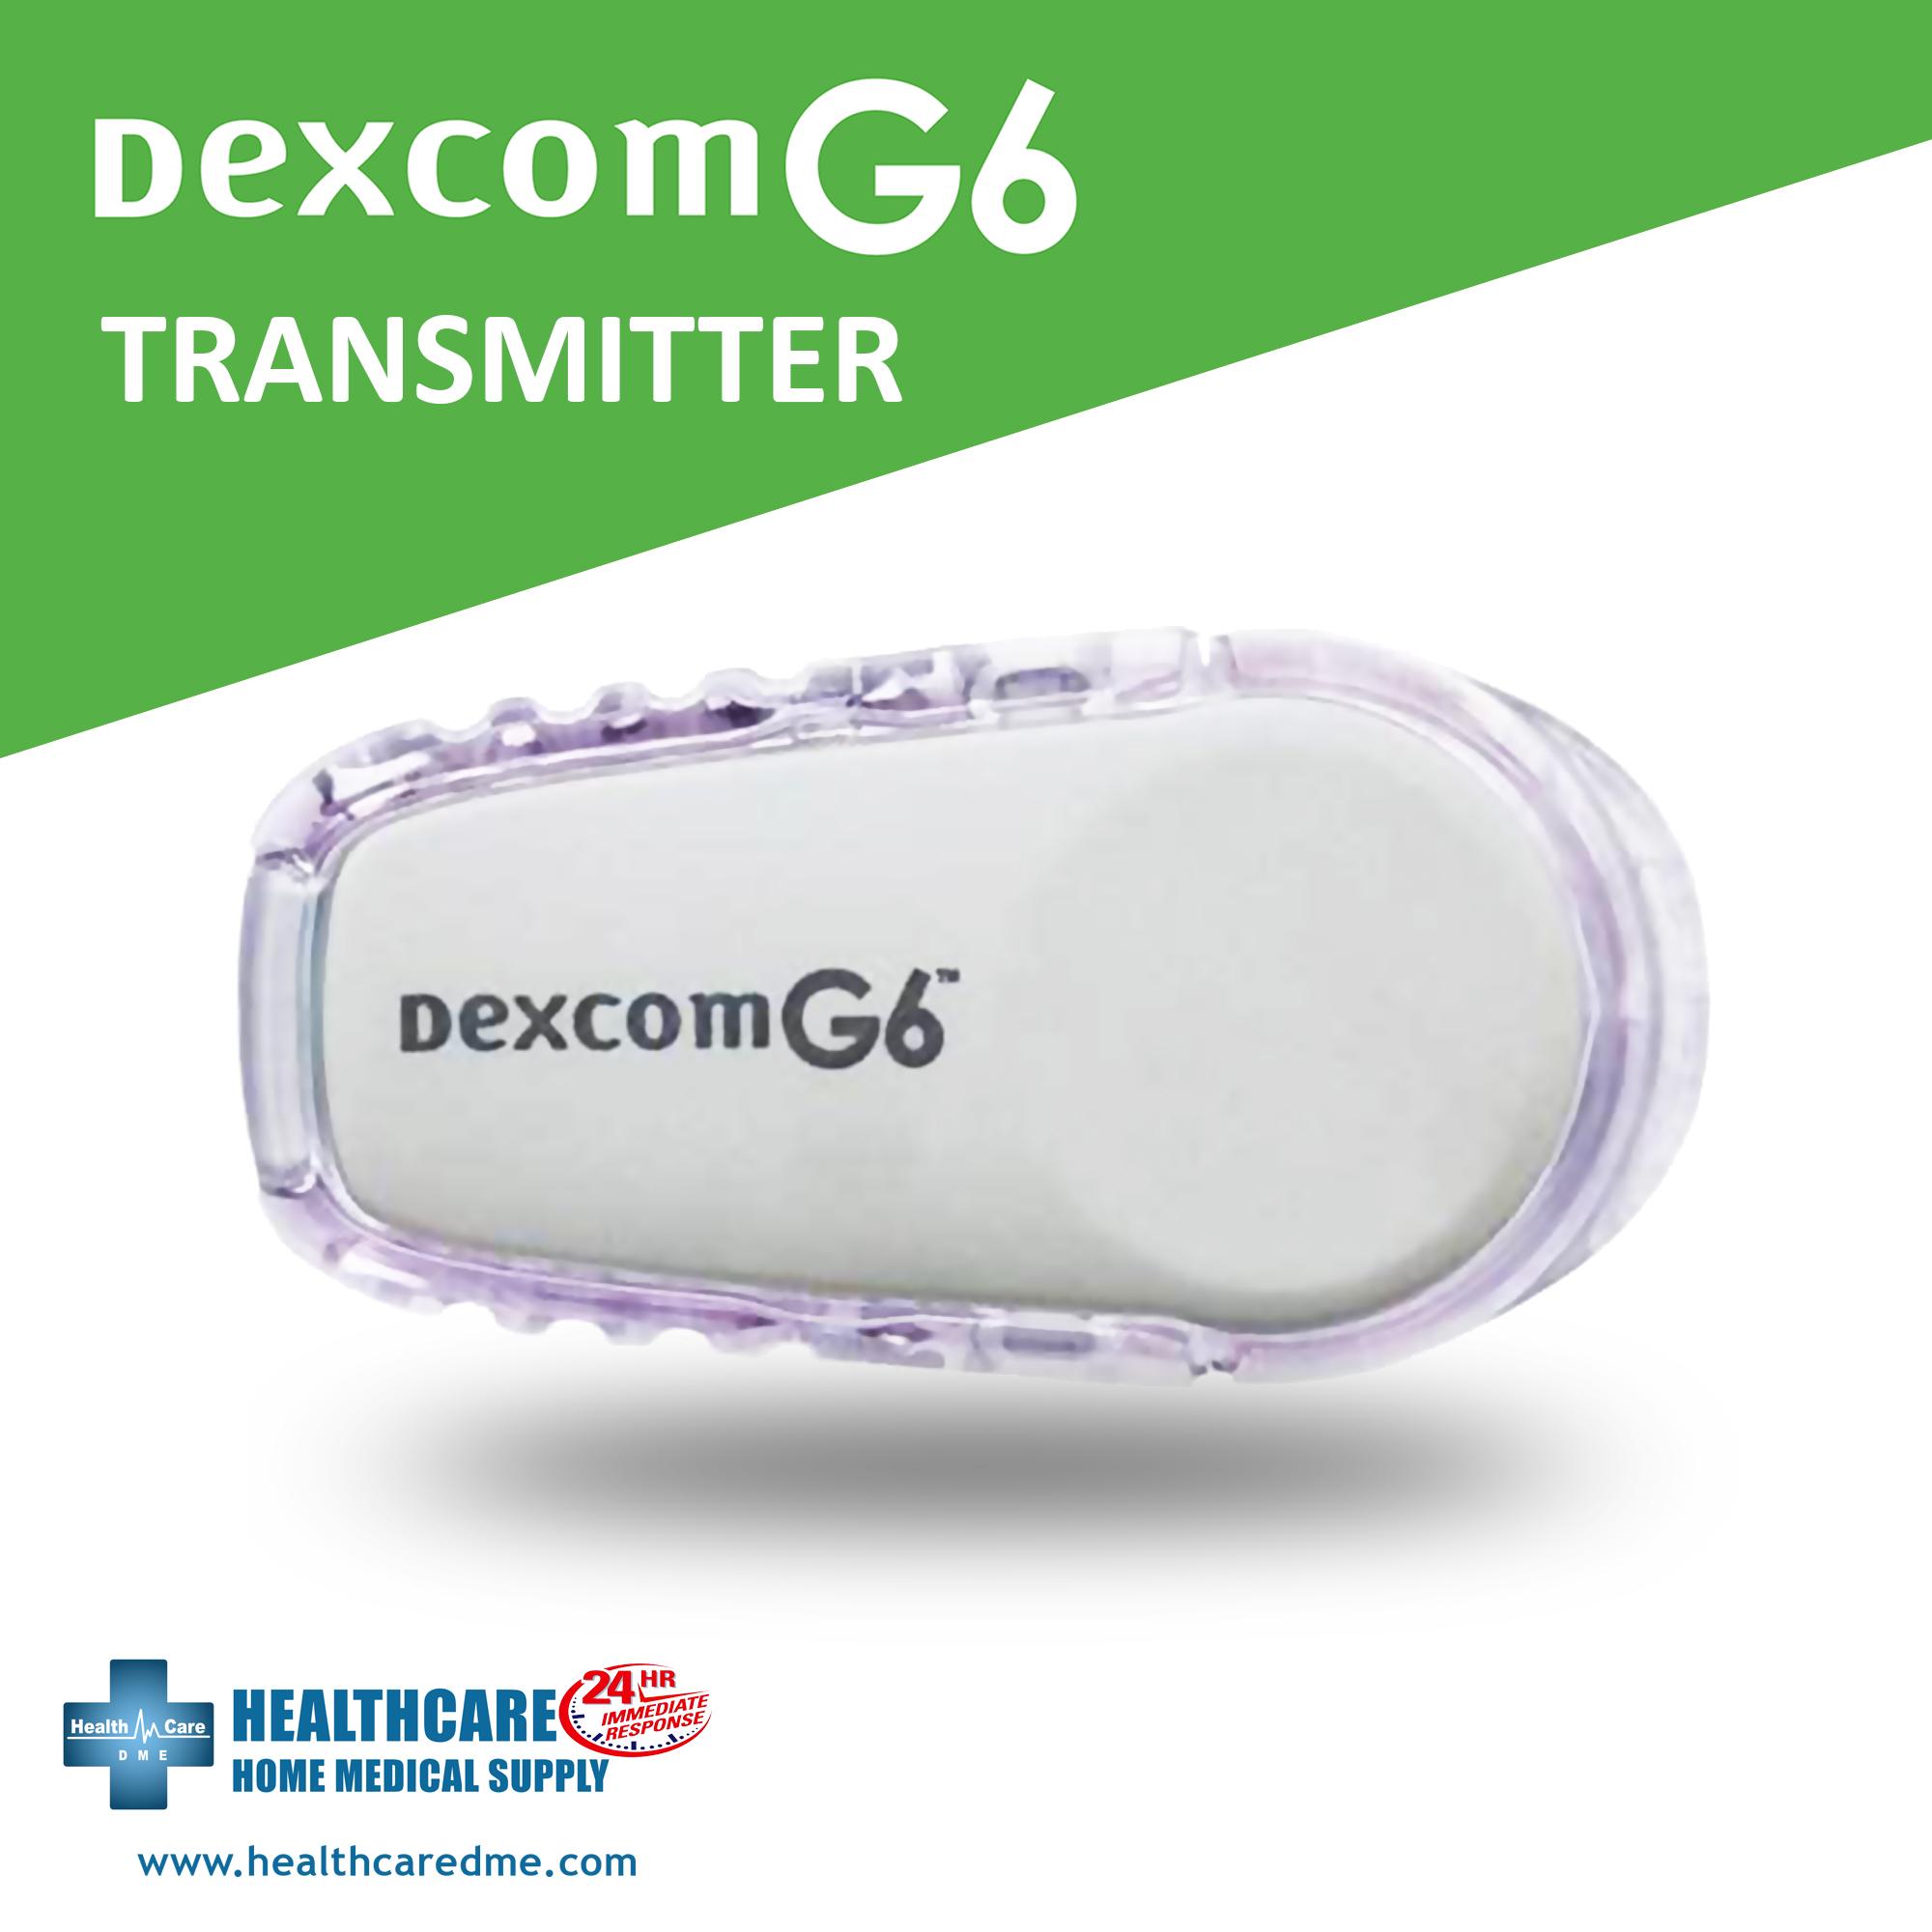 DEXCOM G6 TRANSMITTER | Michigan USA Diabetes Continuous Glucose Monitoring System DEXCOM G6 TRANSMITTER